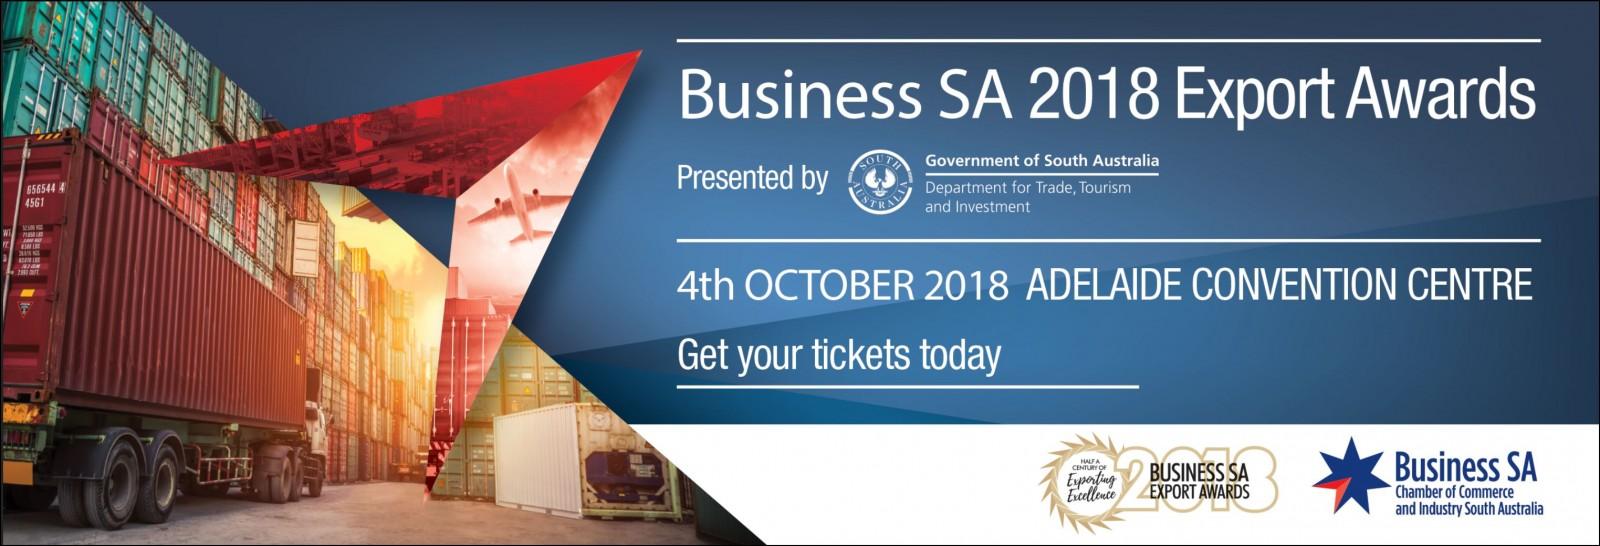 2018 Business SA Export Awards